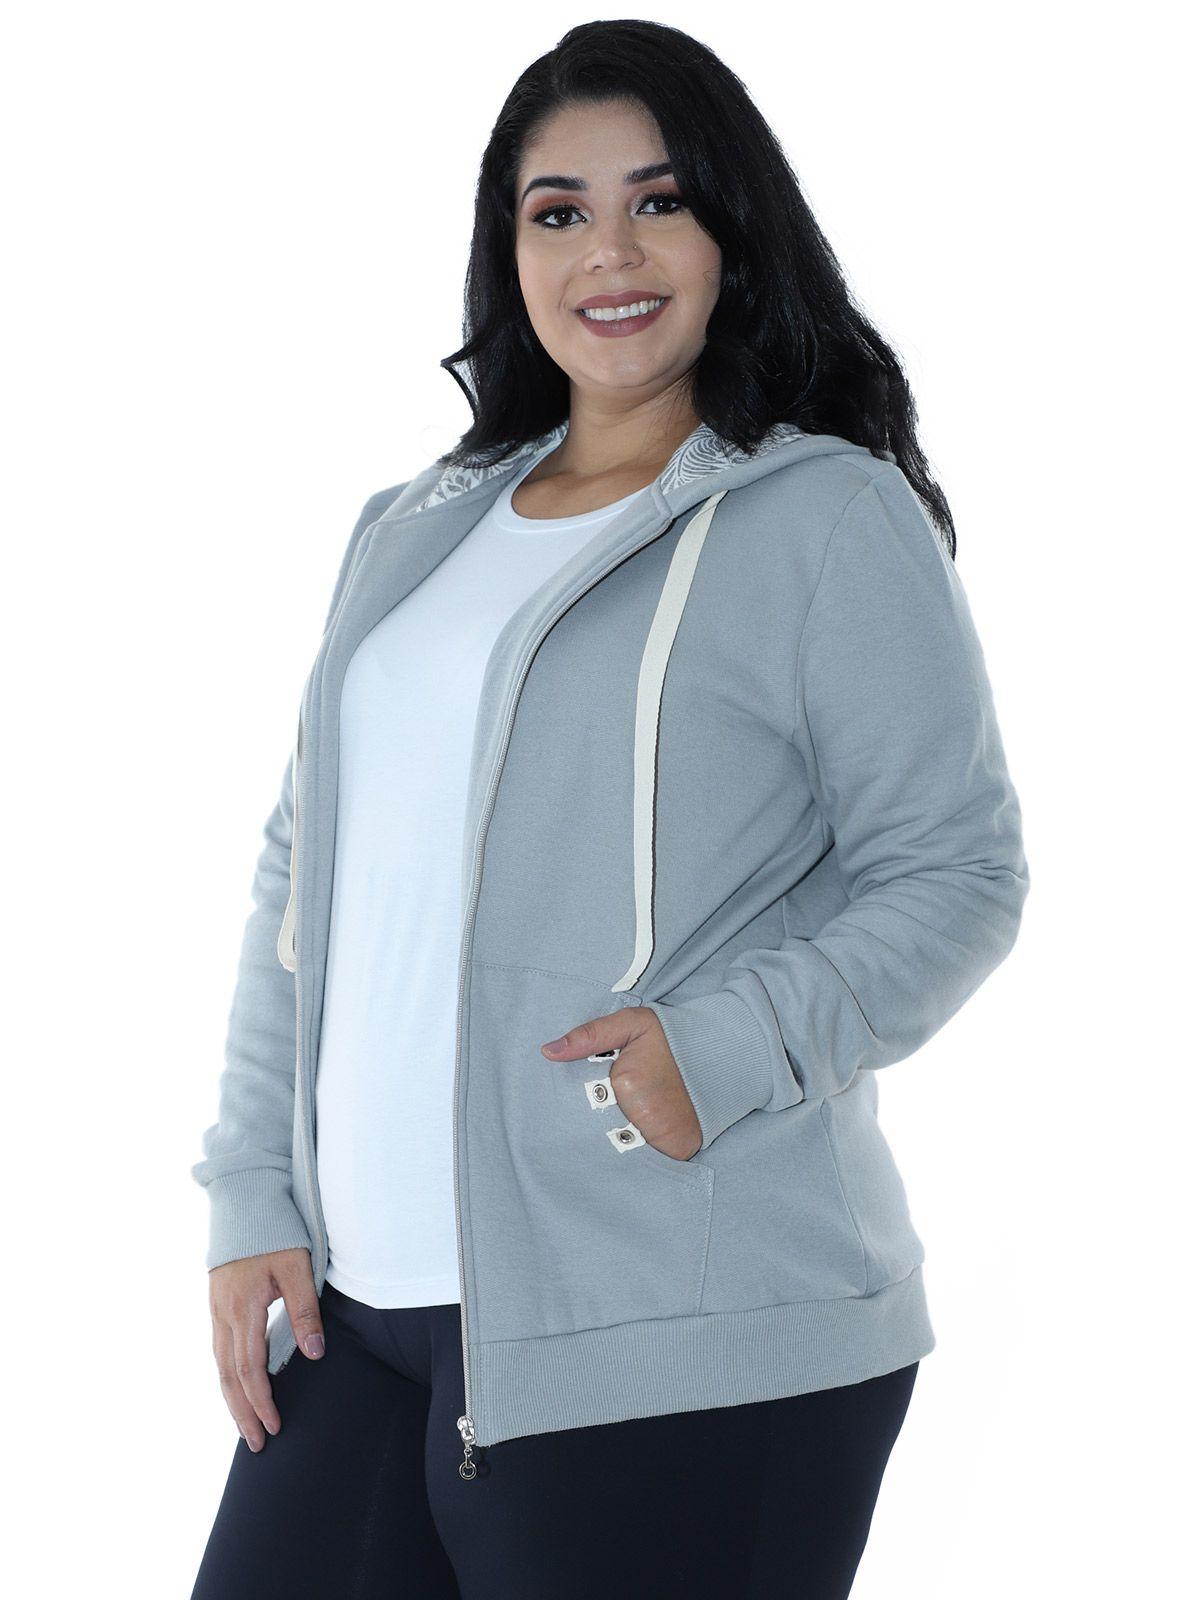 Casaco Plus Size de Moletom Forro do Capuz Estampado Cinza